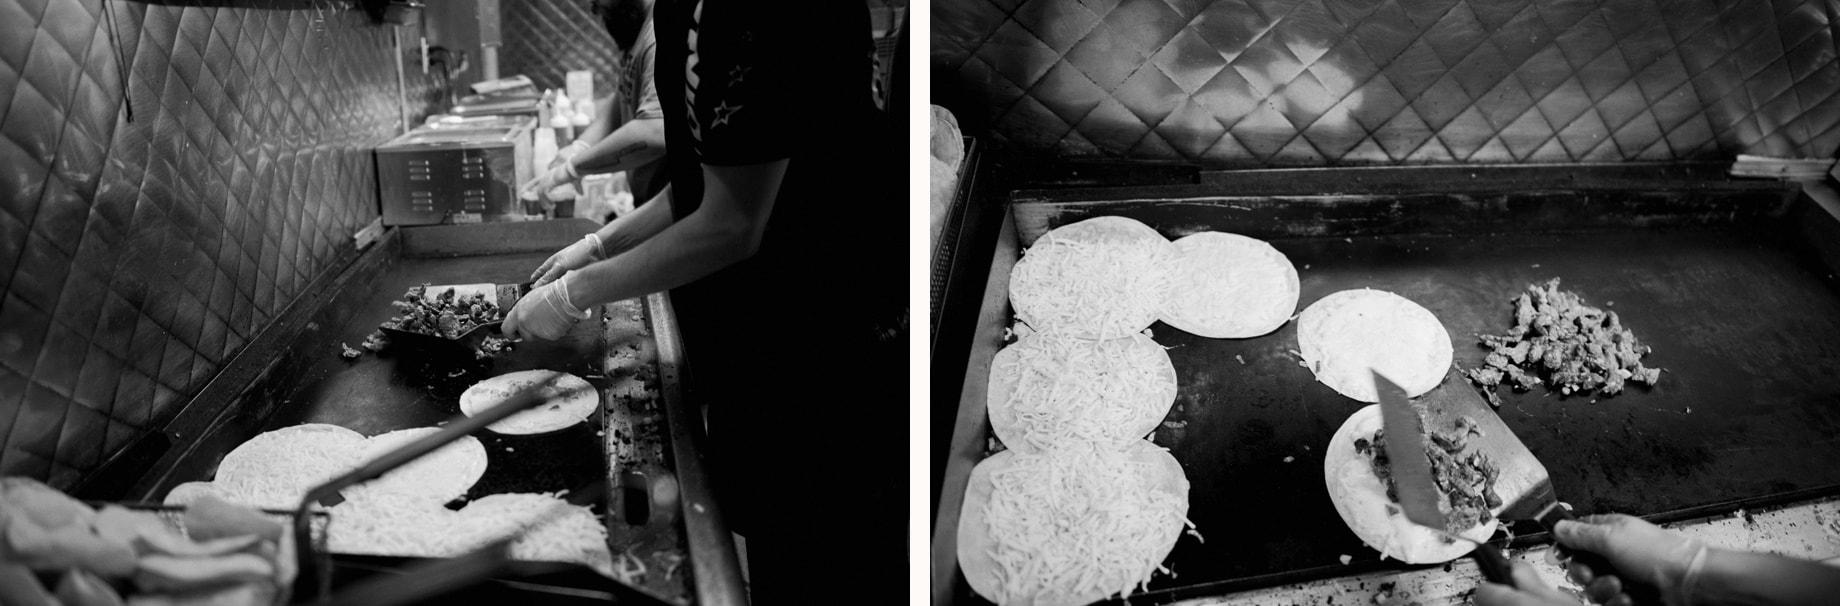 luncha libre food truck at wedding